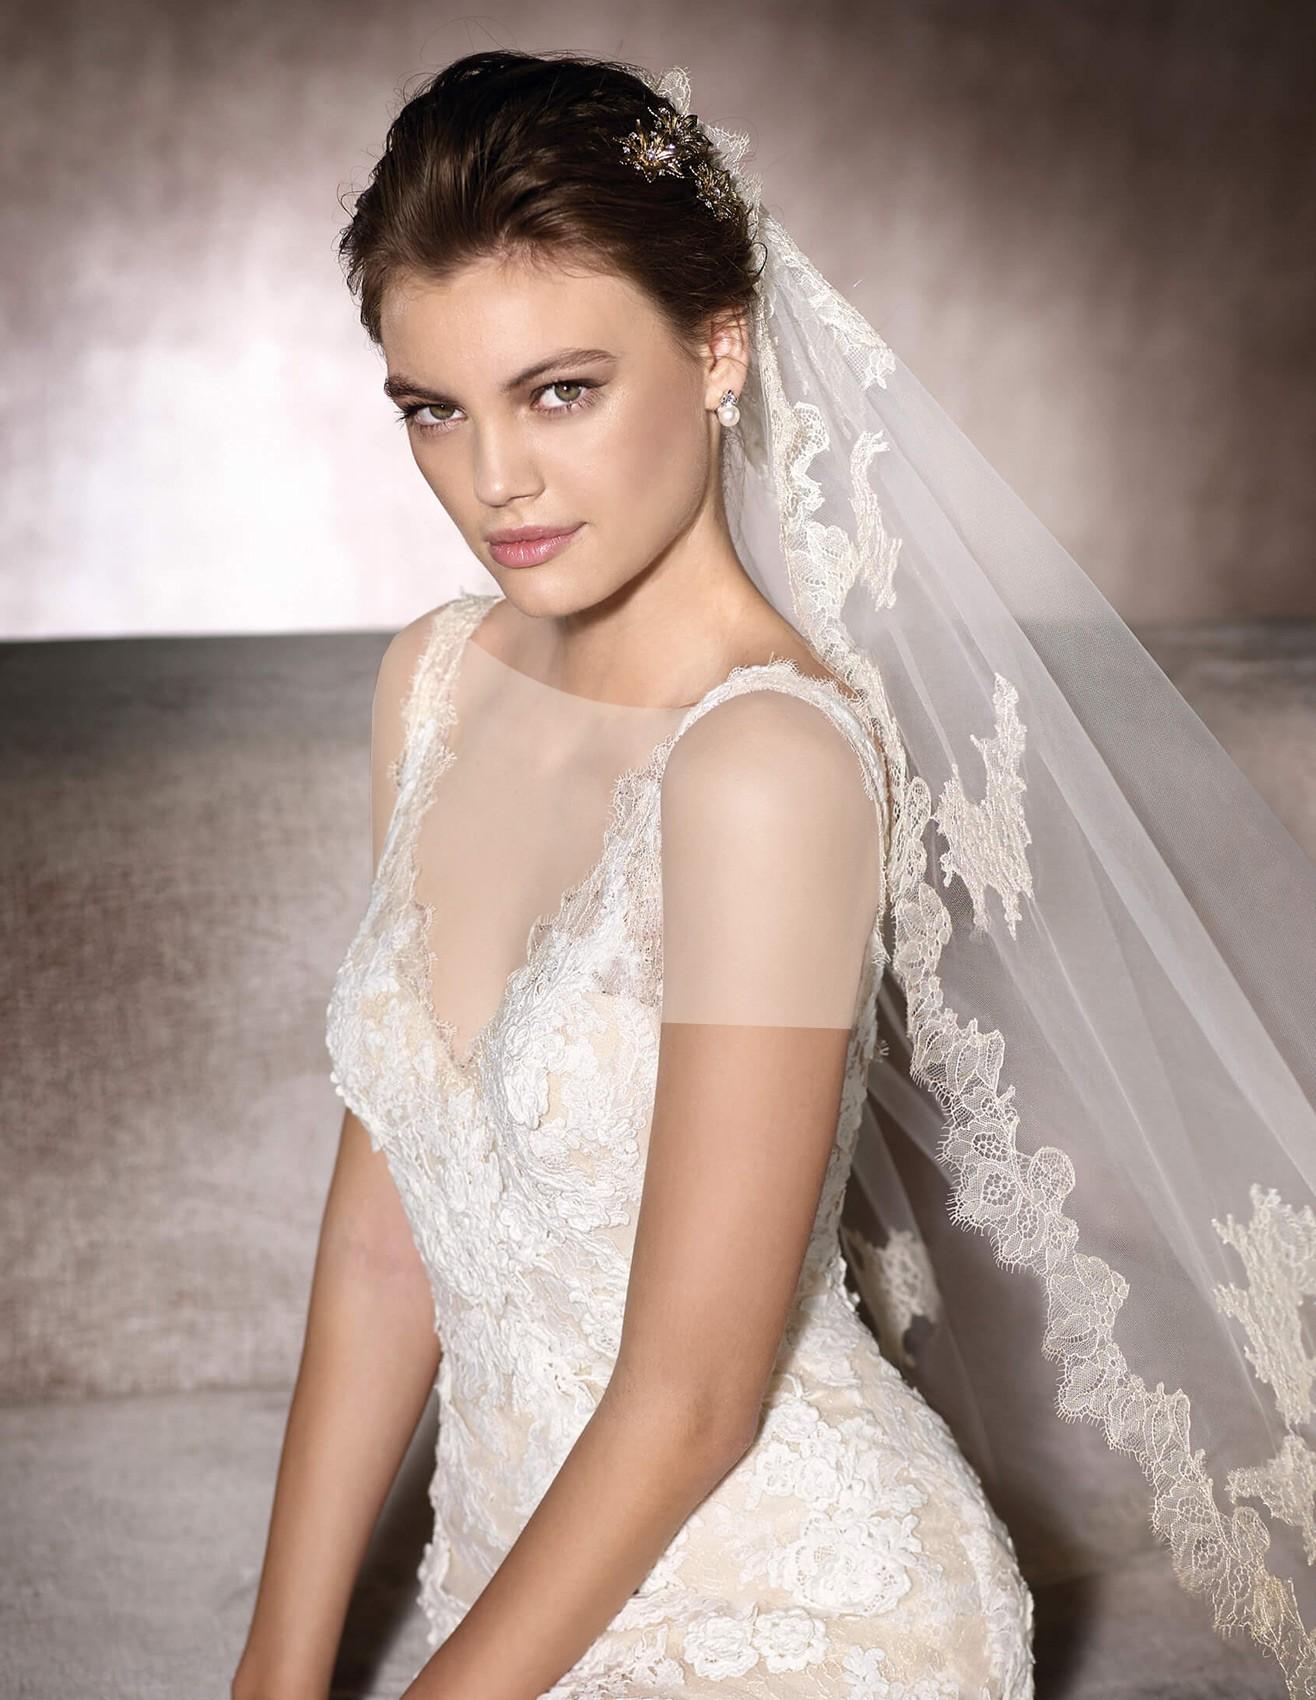 آرایش عروس 2017